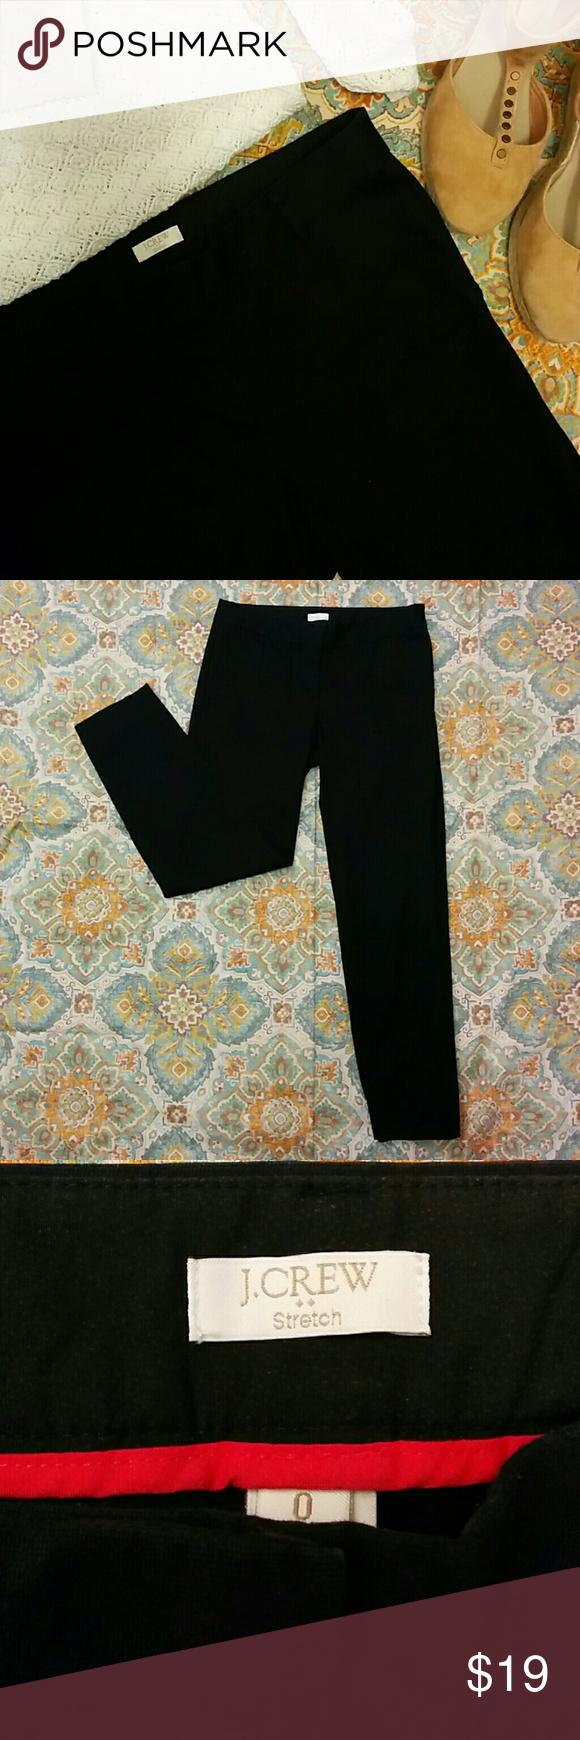 "J. Crew Crop Trousers Black crop trousers. 98% Cotton 2% Spandex. 26"" inseam. J. Crew Pants Trousers"